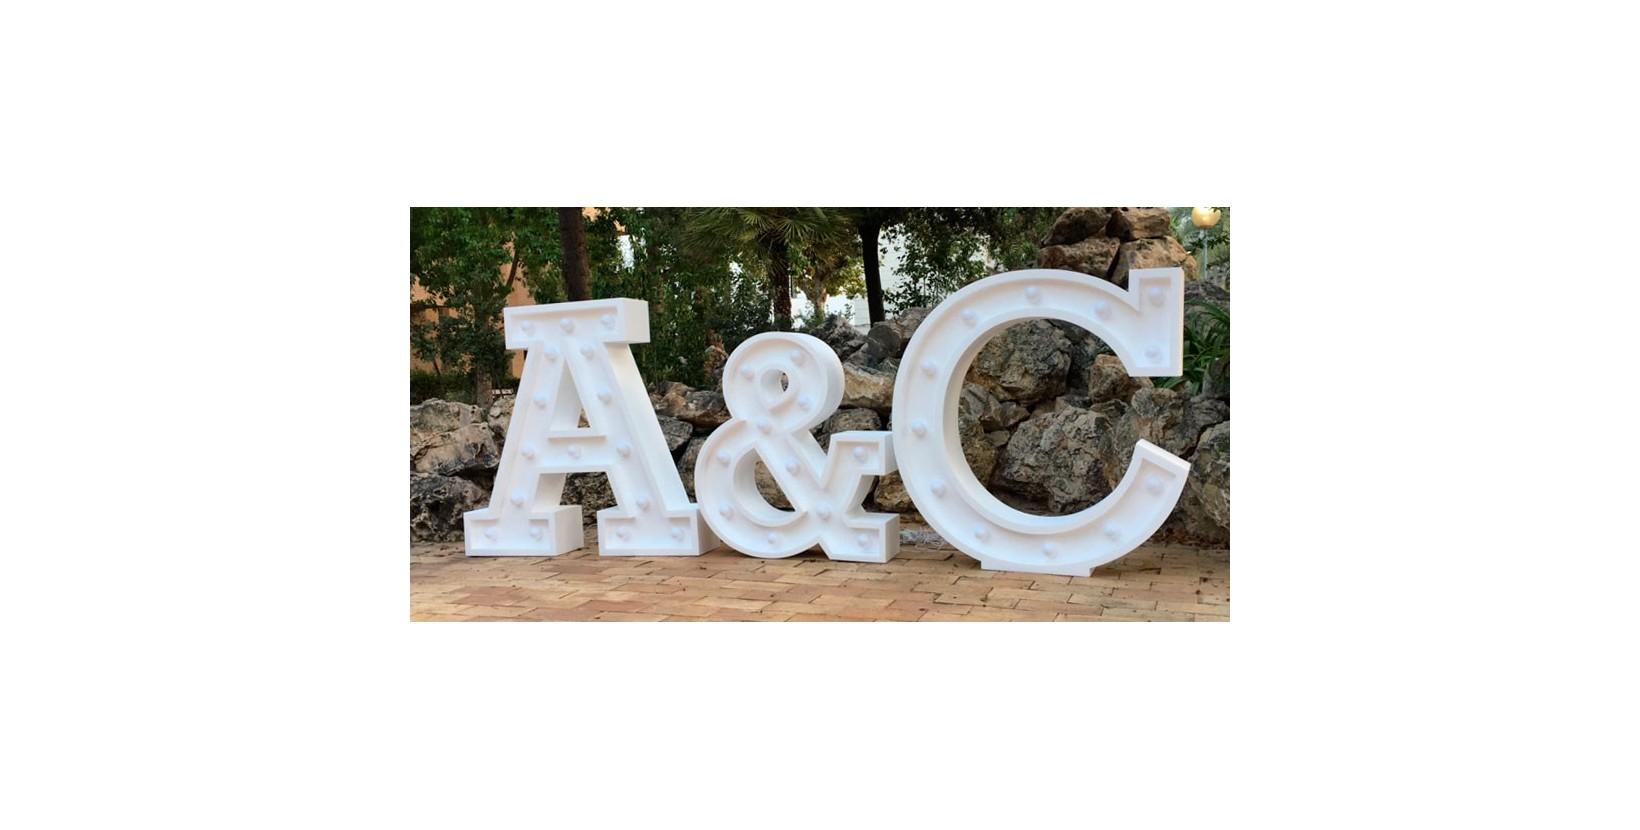 Letras gigantes boda con luz - Letras luminosas decoracion ...